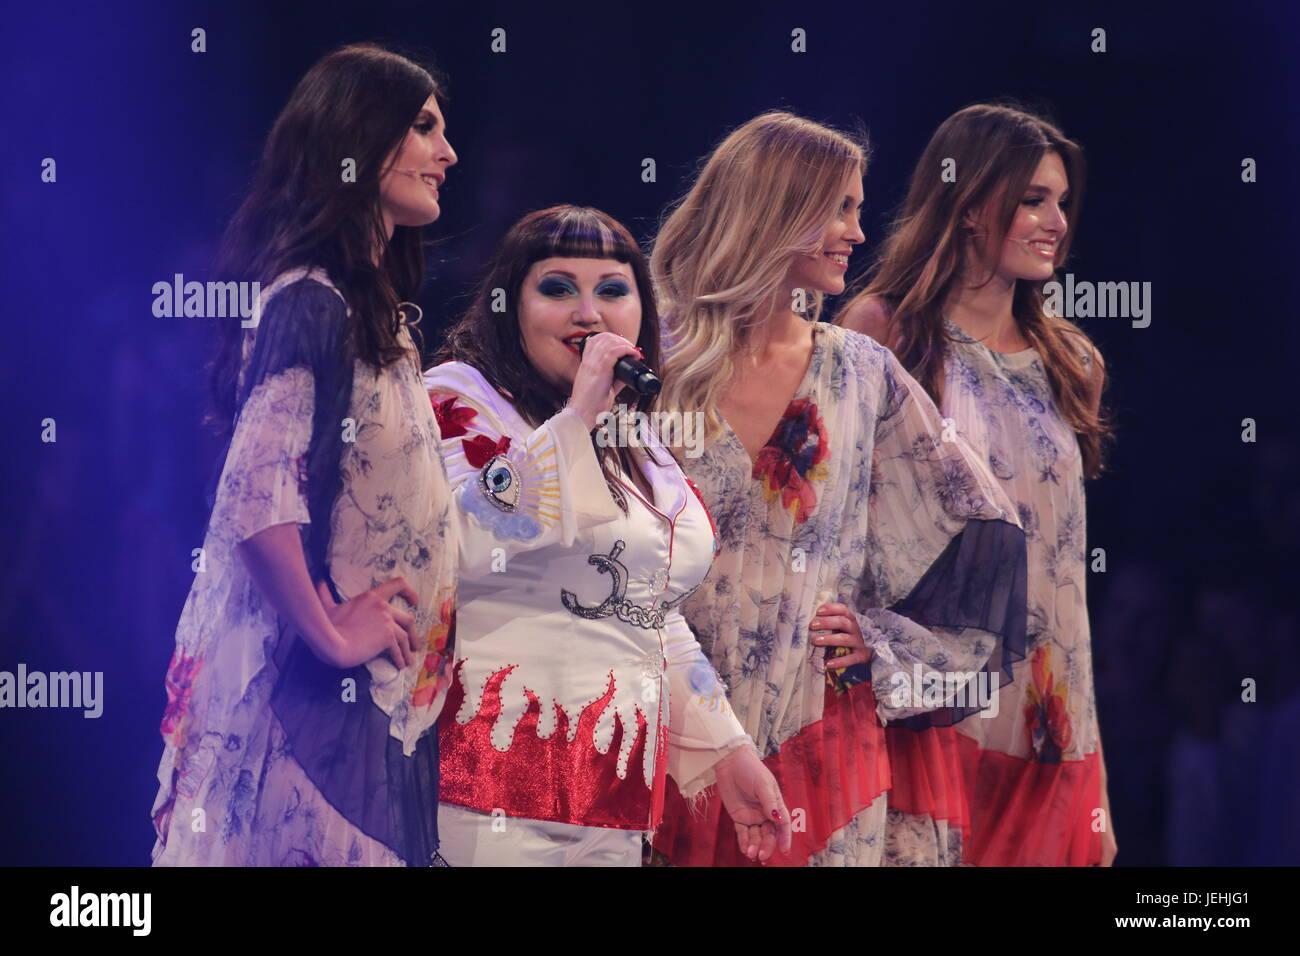 Finale Germanie Next Topmodel 2017 Oberhausen 25.05.2017 dotate: Beth dito, Celine (GNTM Siegerin 2017), Serlina Immagini Stock